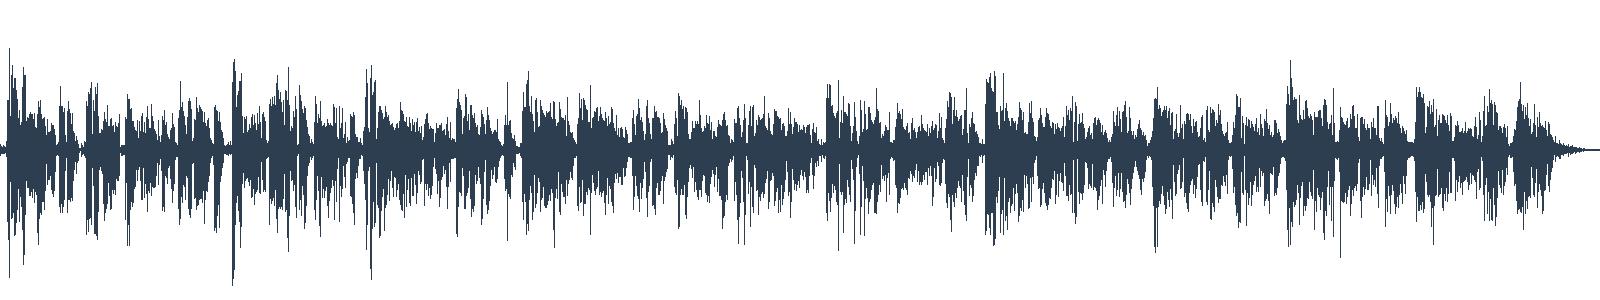 Nové audioknihy 7/2019 waveform